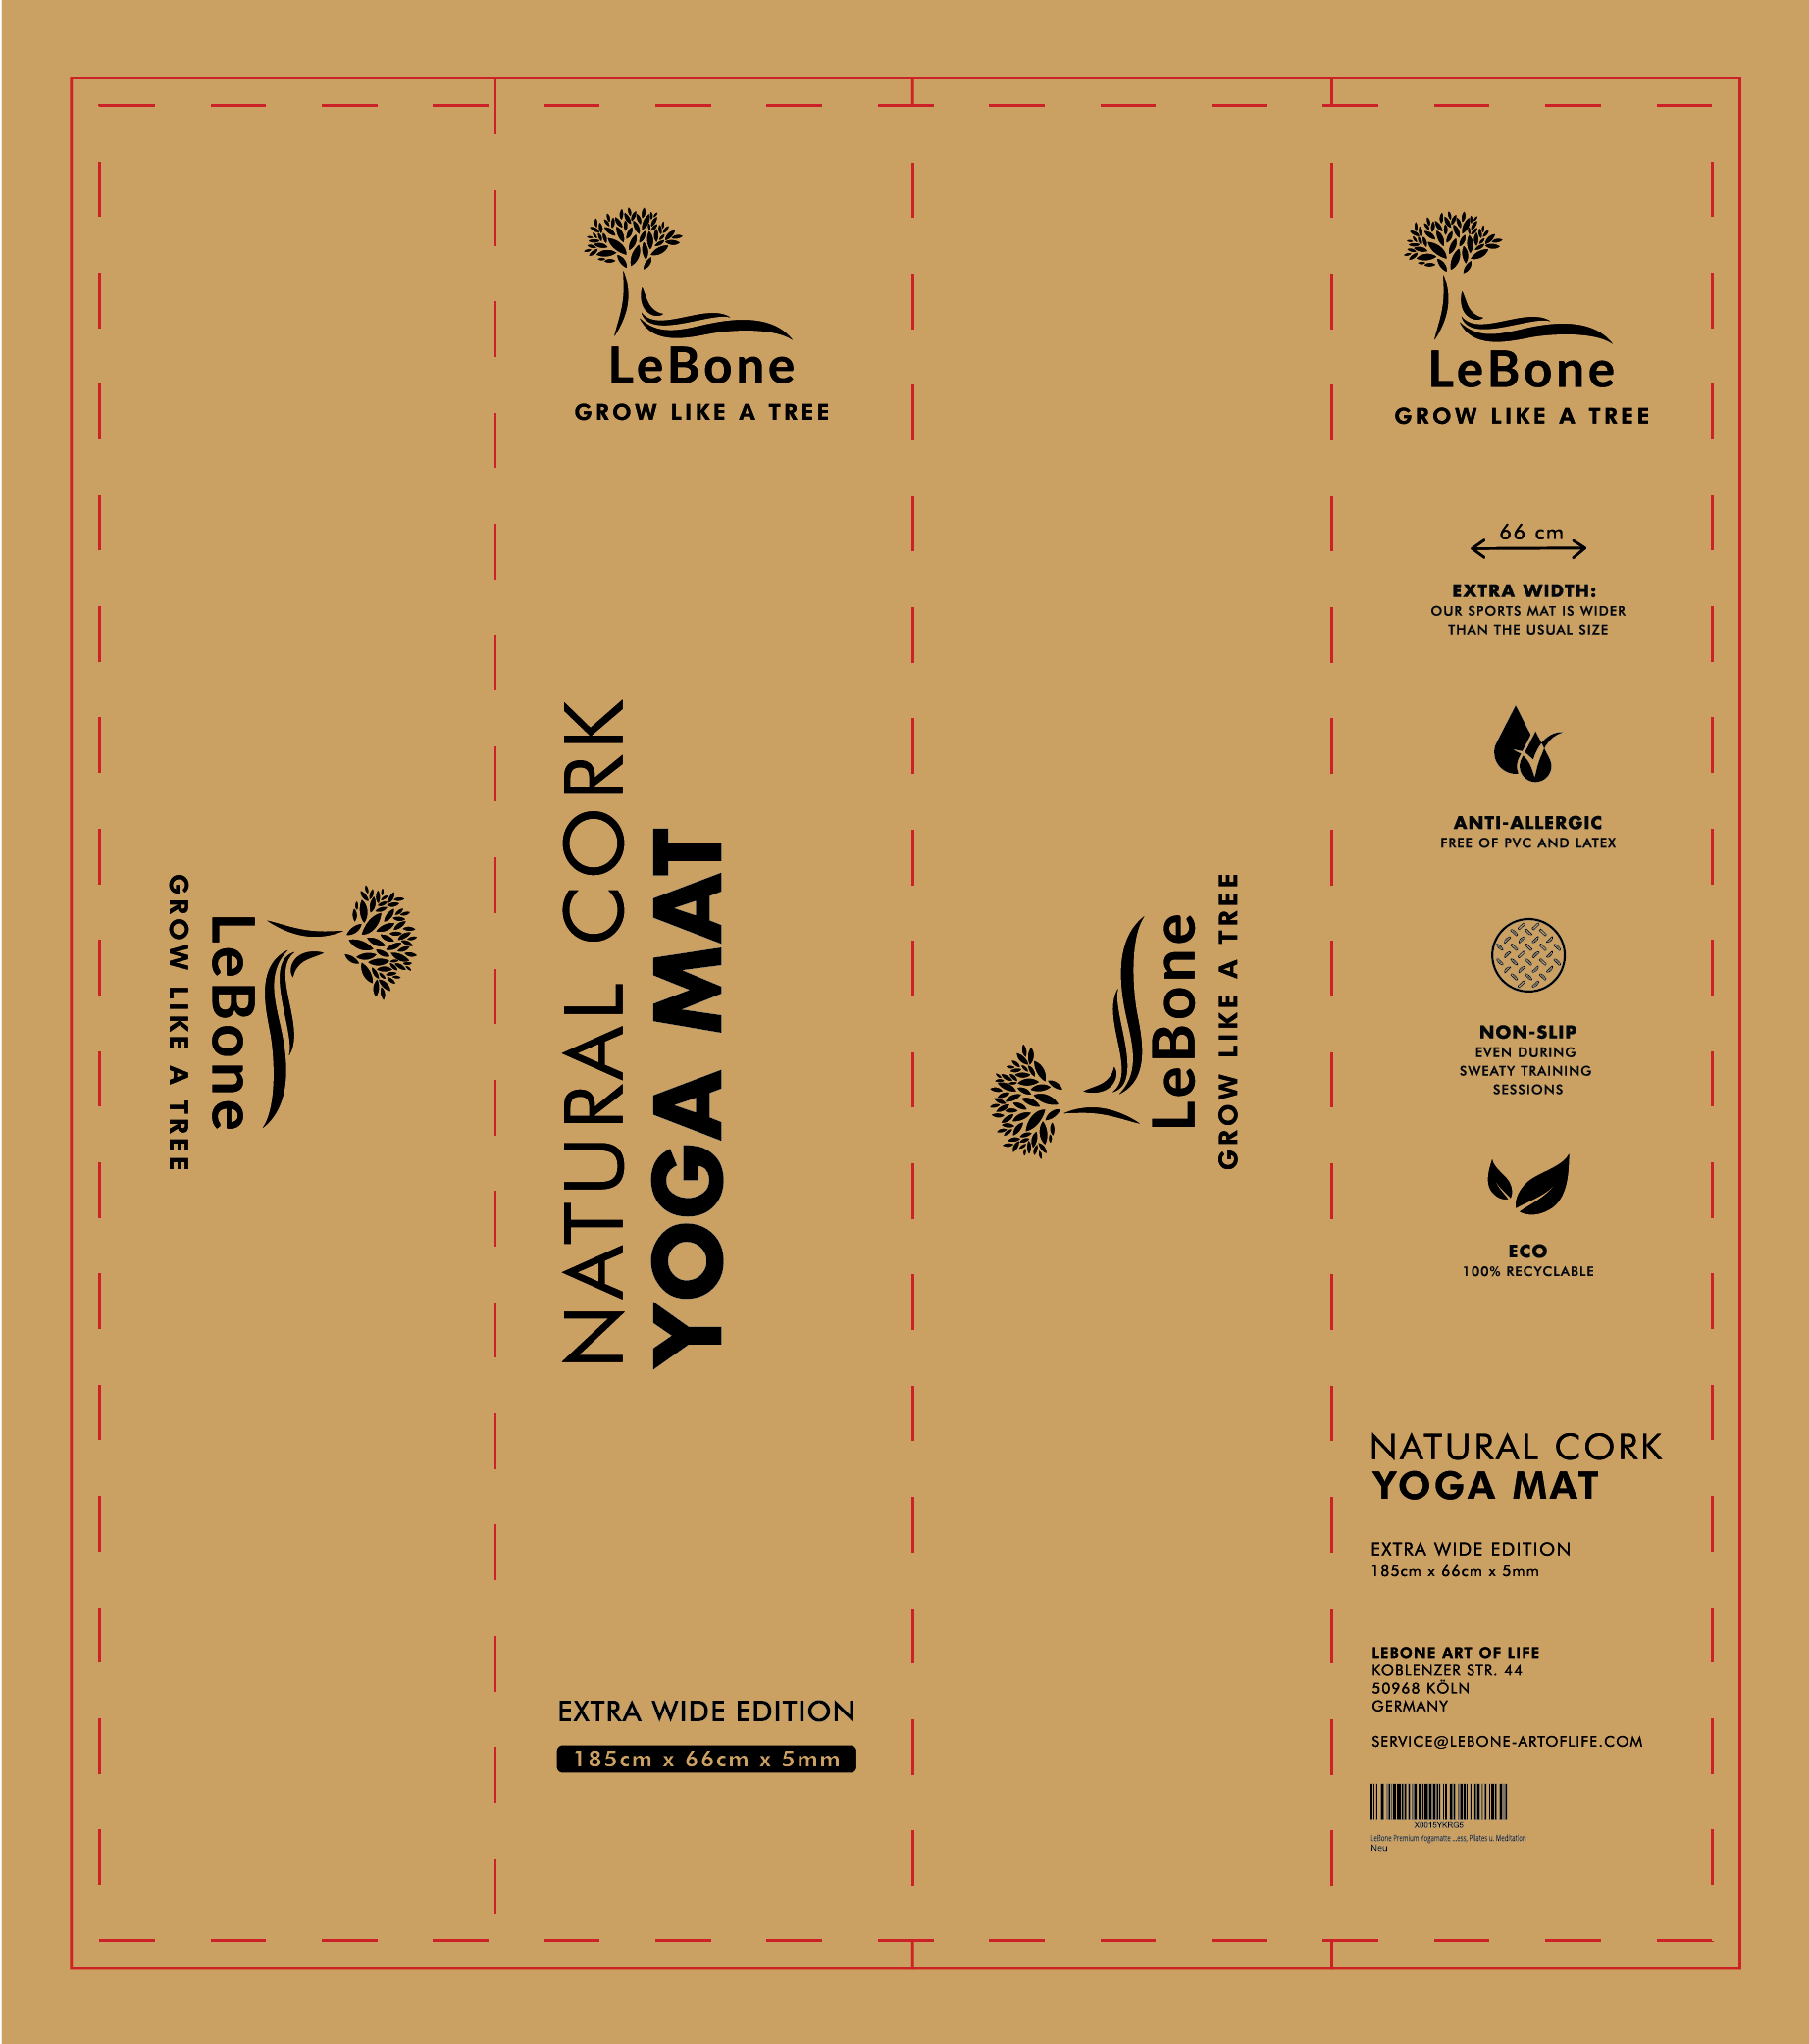 Packaging design of carton box for yoga mat